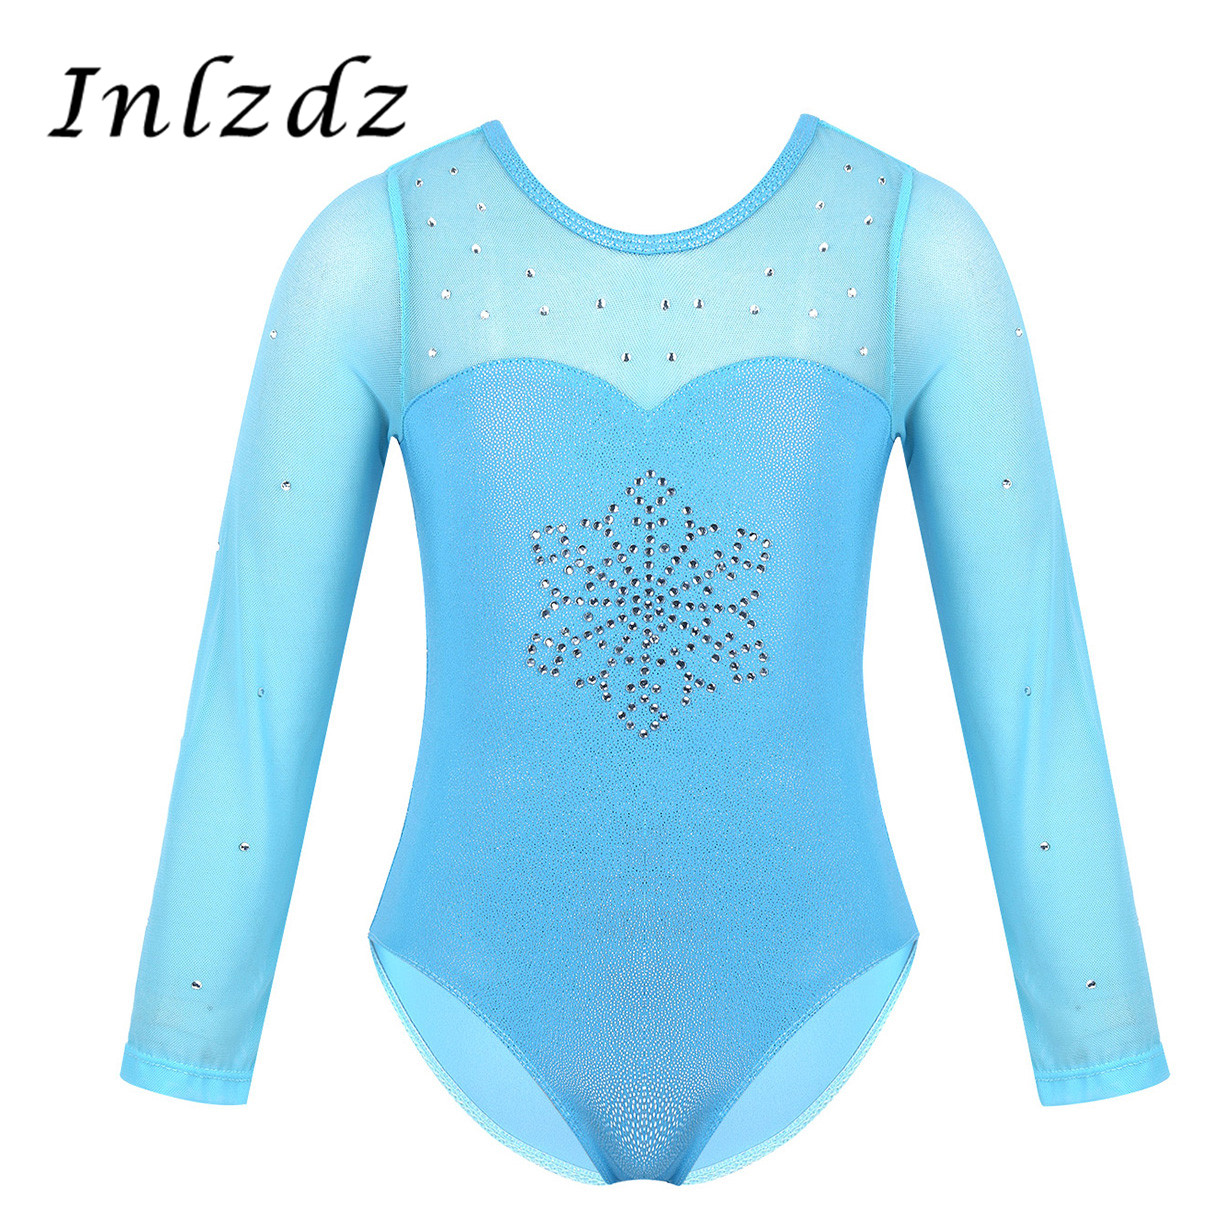 Kids Girls Gymnastics Swimsuit For Dancing Rhinestone Snowflake Tulle Dancewear Splice Gymnastics Leotard Ballet Dance Bodysuit